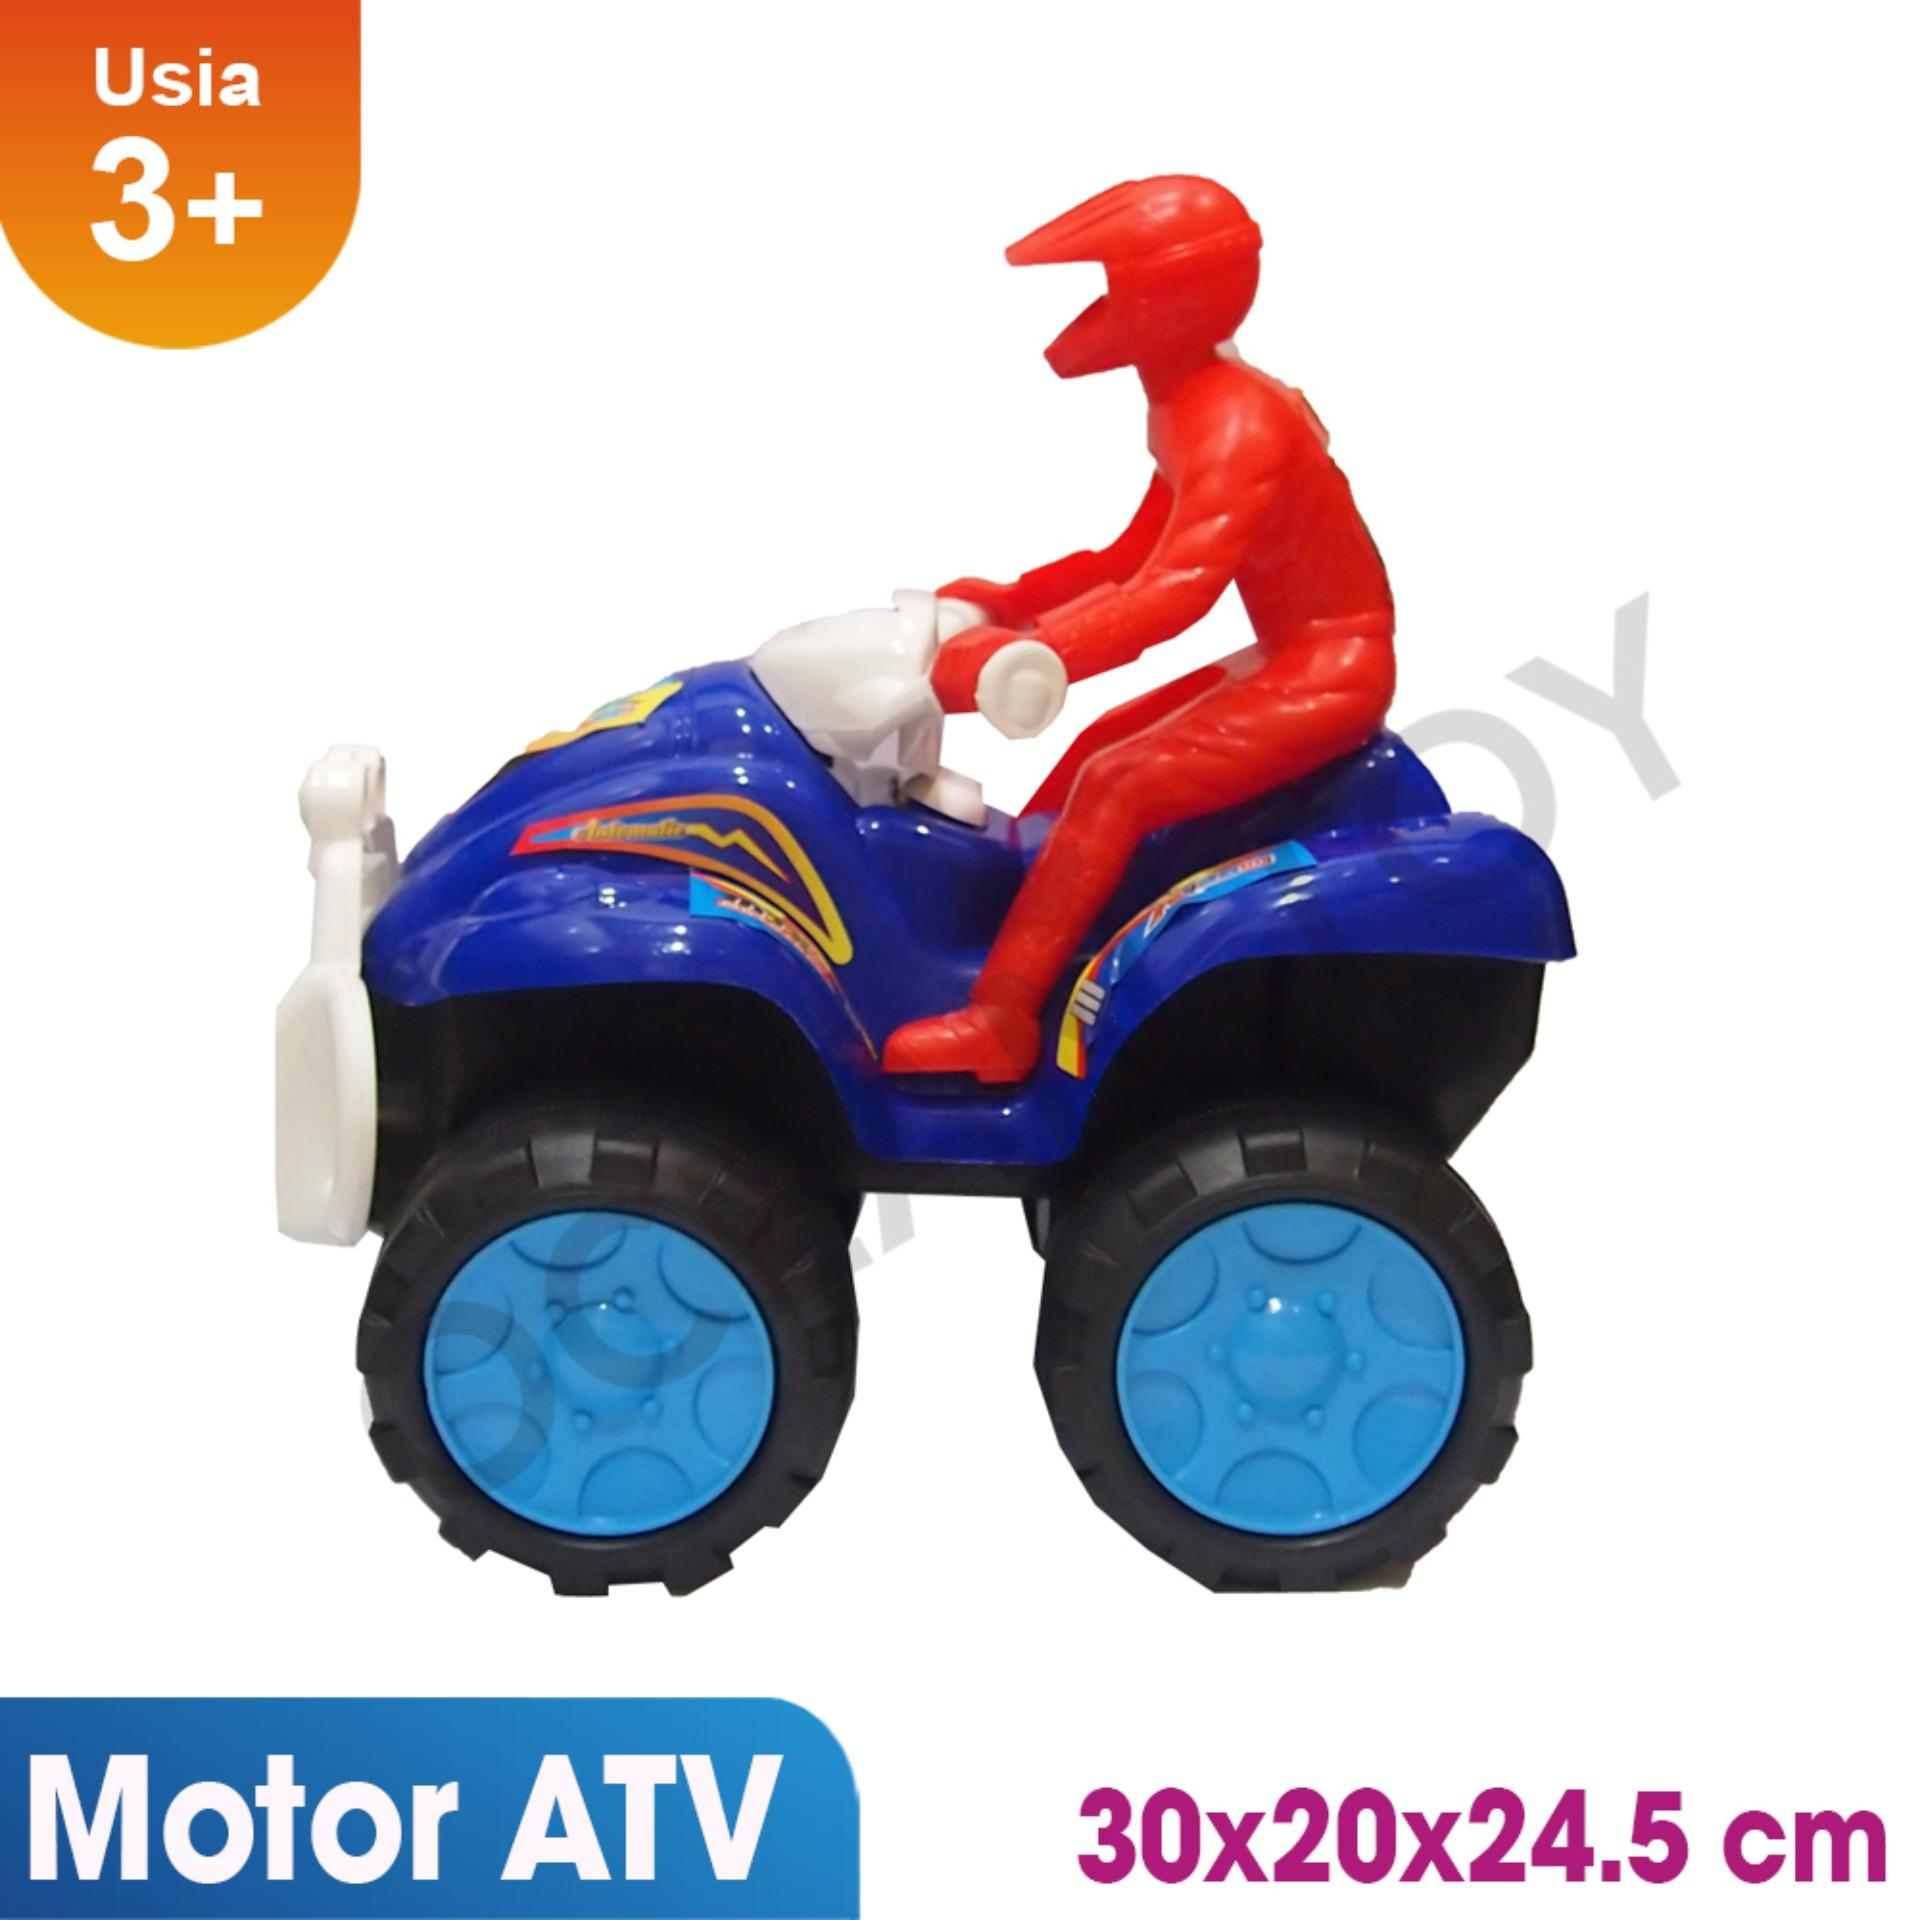 Ocean Toy Motor ATV + Orang Mainan Anak OCT6007BC - Biru